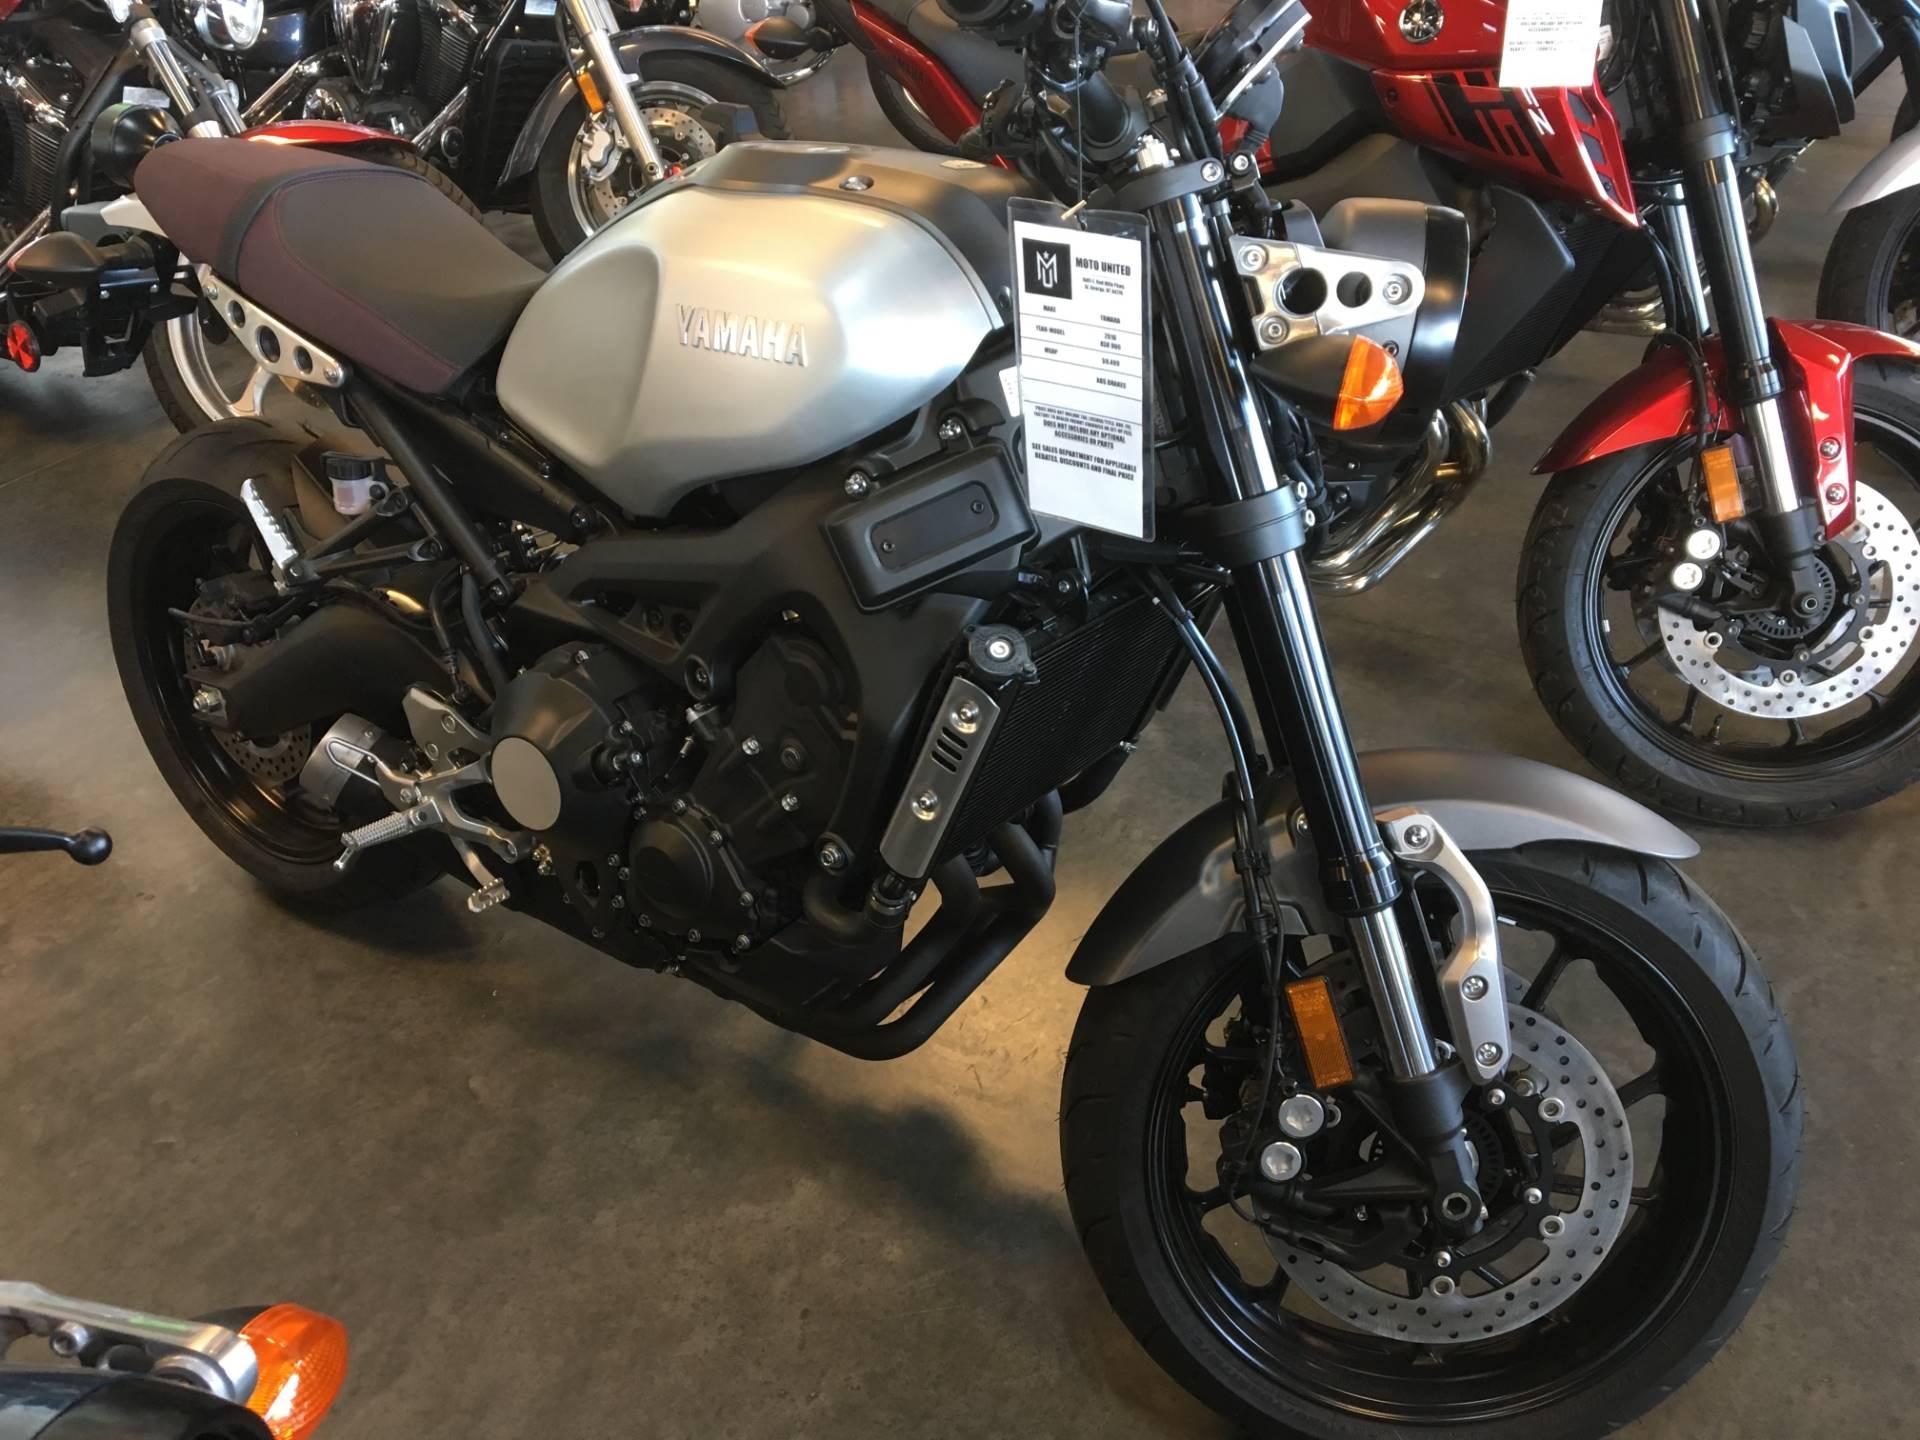 2016 Yamaha XSR900 for sale 100237